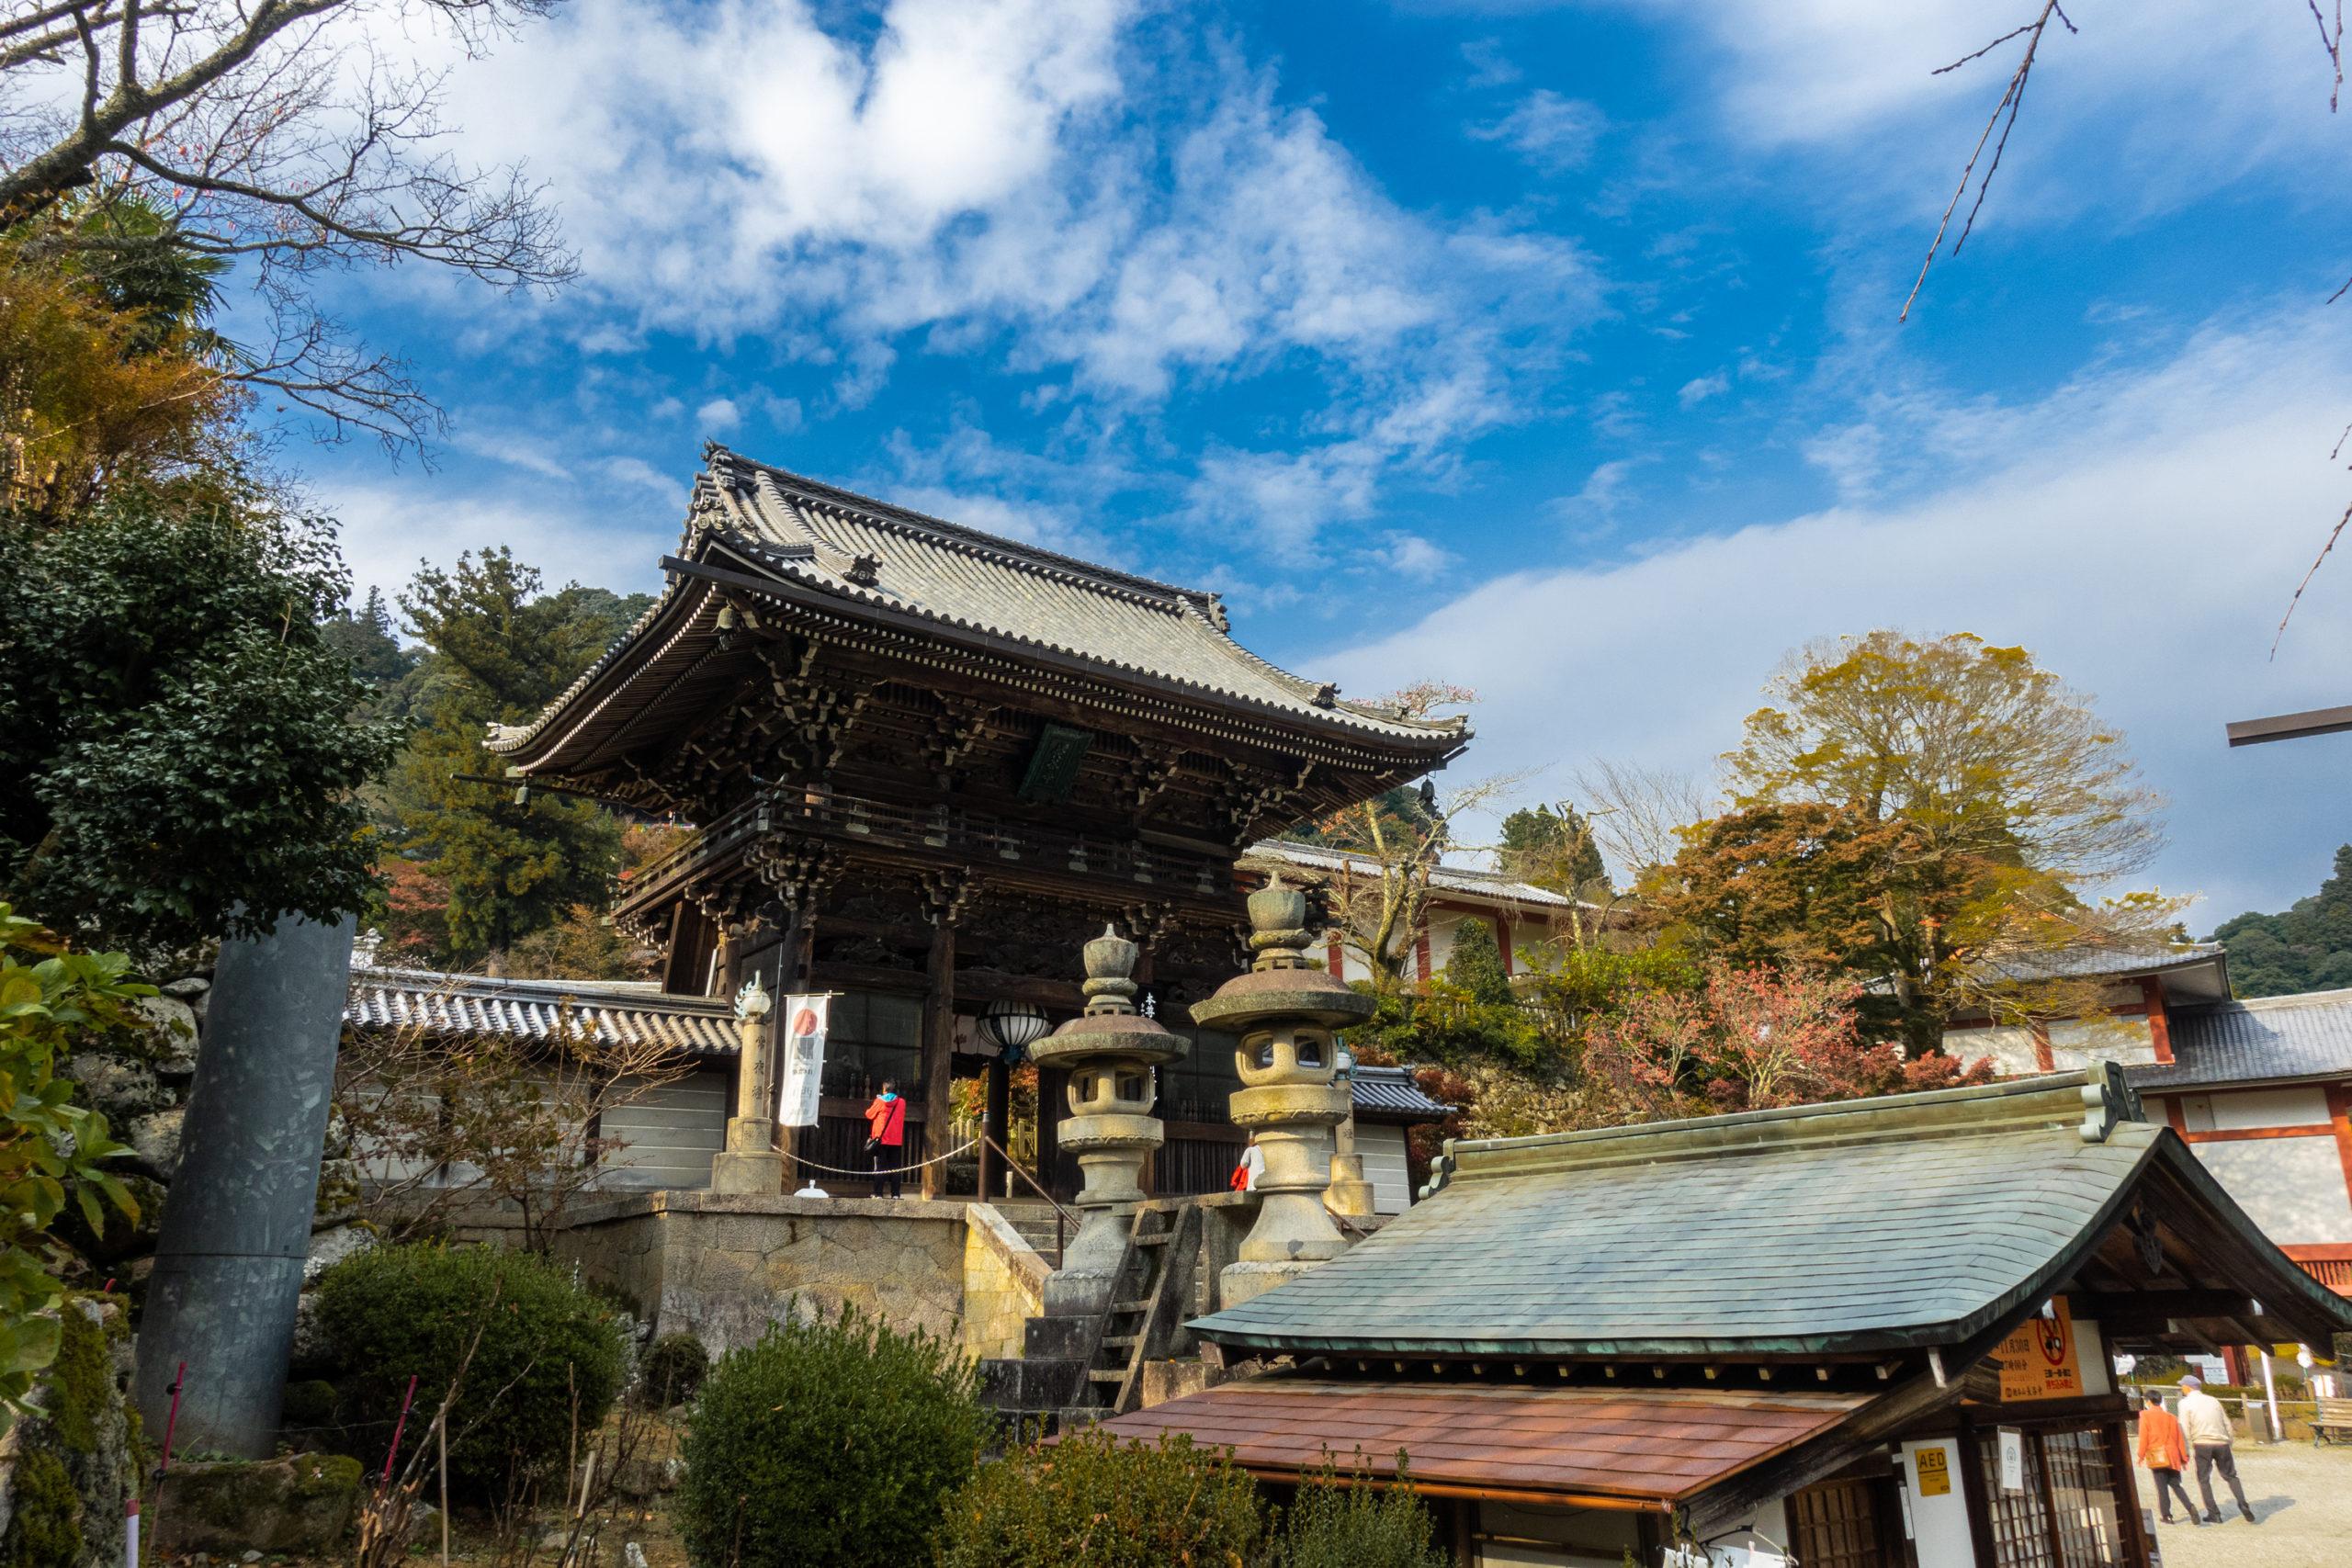 DSC00418-scaled 奈良県  長谷寺(風情を感じる五重塔と紅葉景色が美しい秋のおすすめスポット! 撮影した写真の紹介、アクセス情報や駐車場情報など)